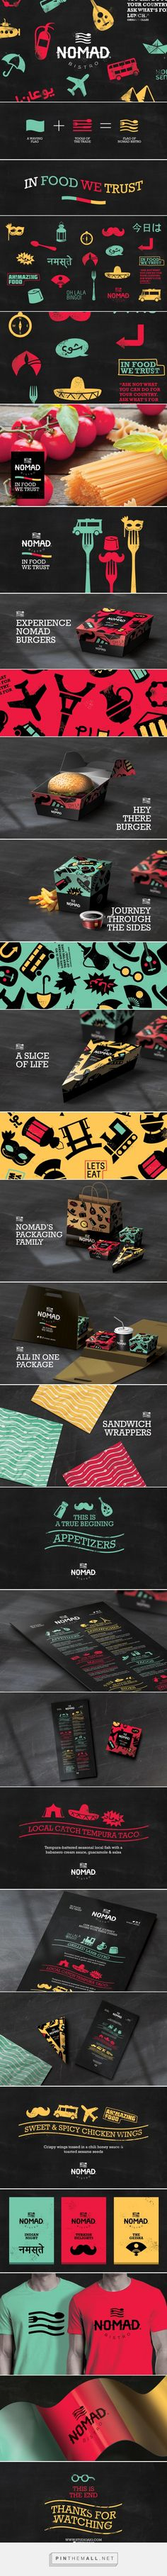 Nomad Bistro Branding by Studio AIO on Behance   Fivestar Branding – Design and…